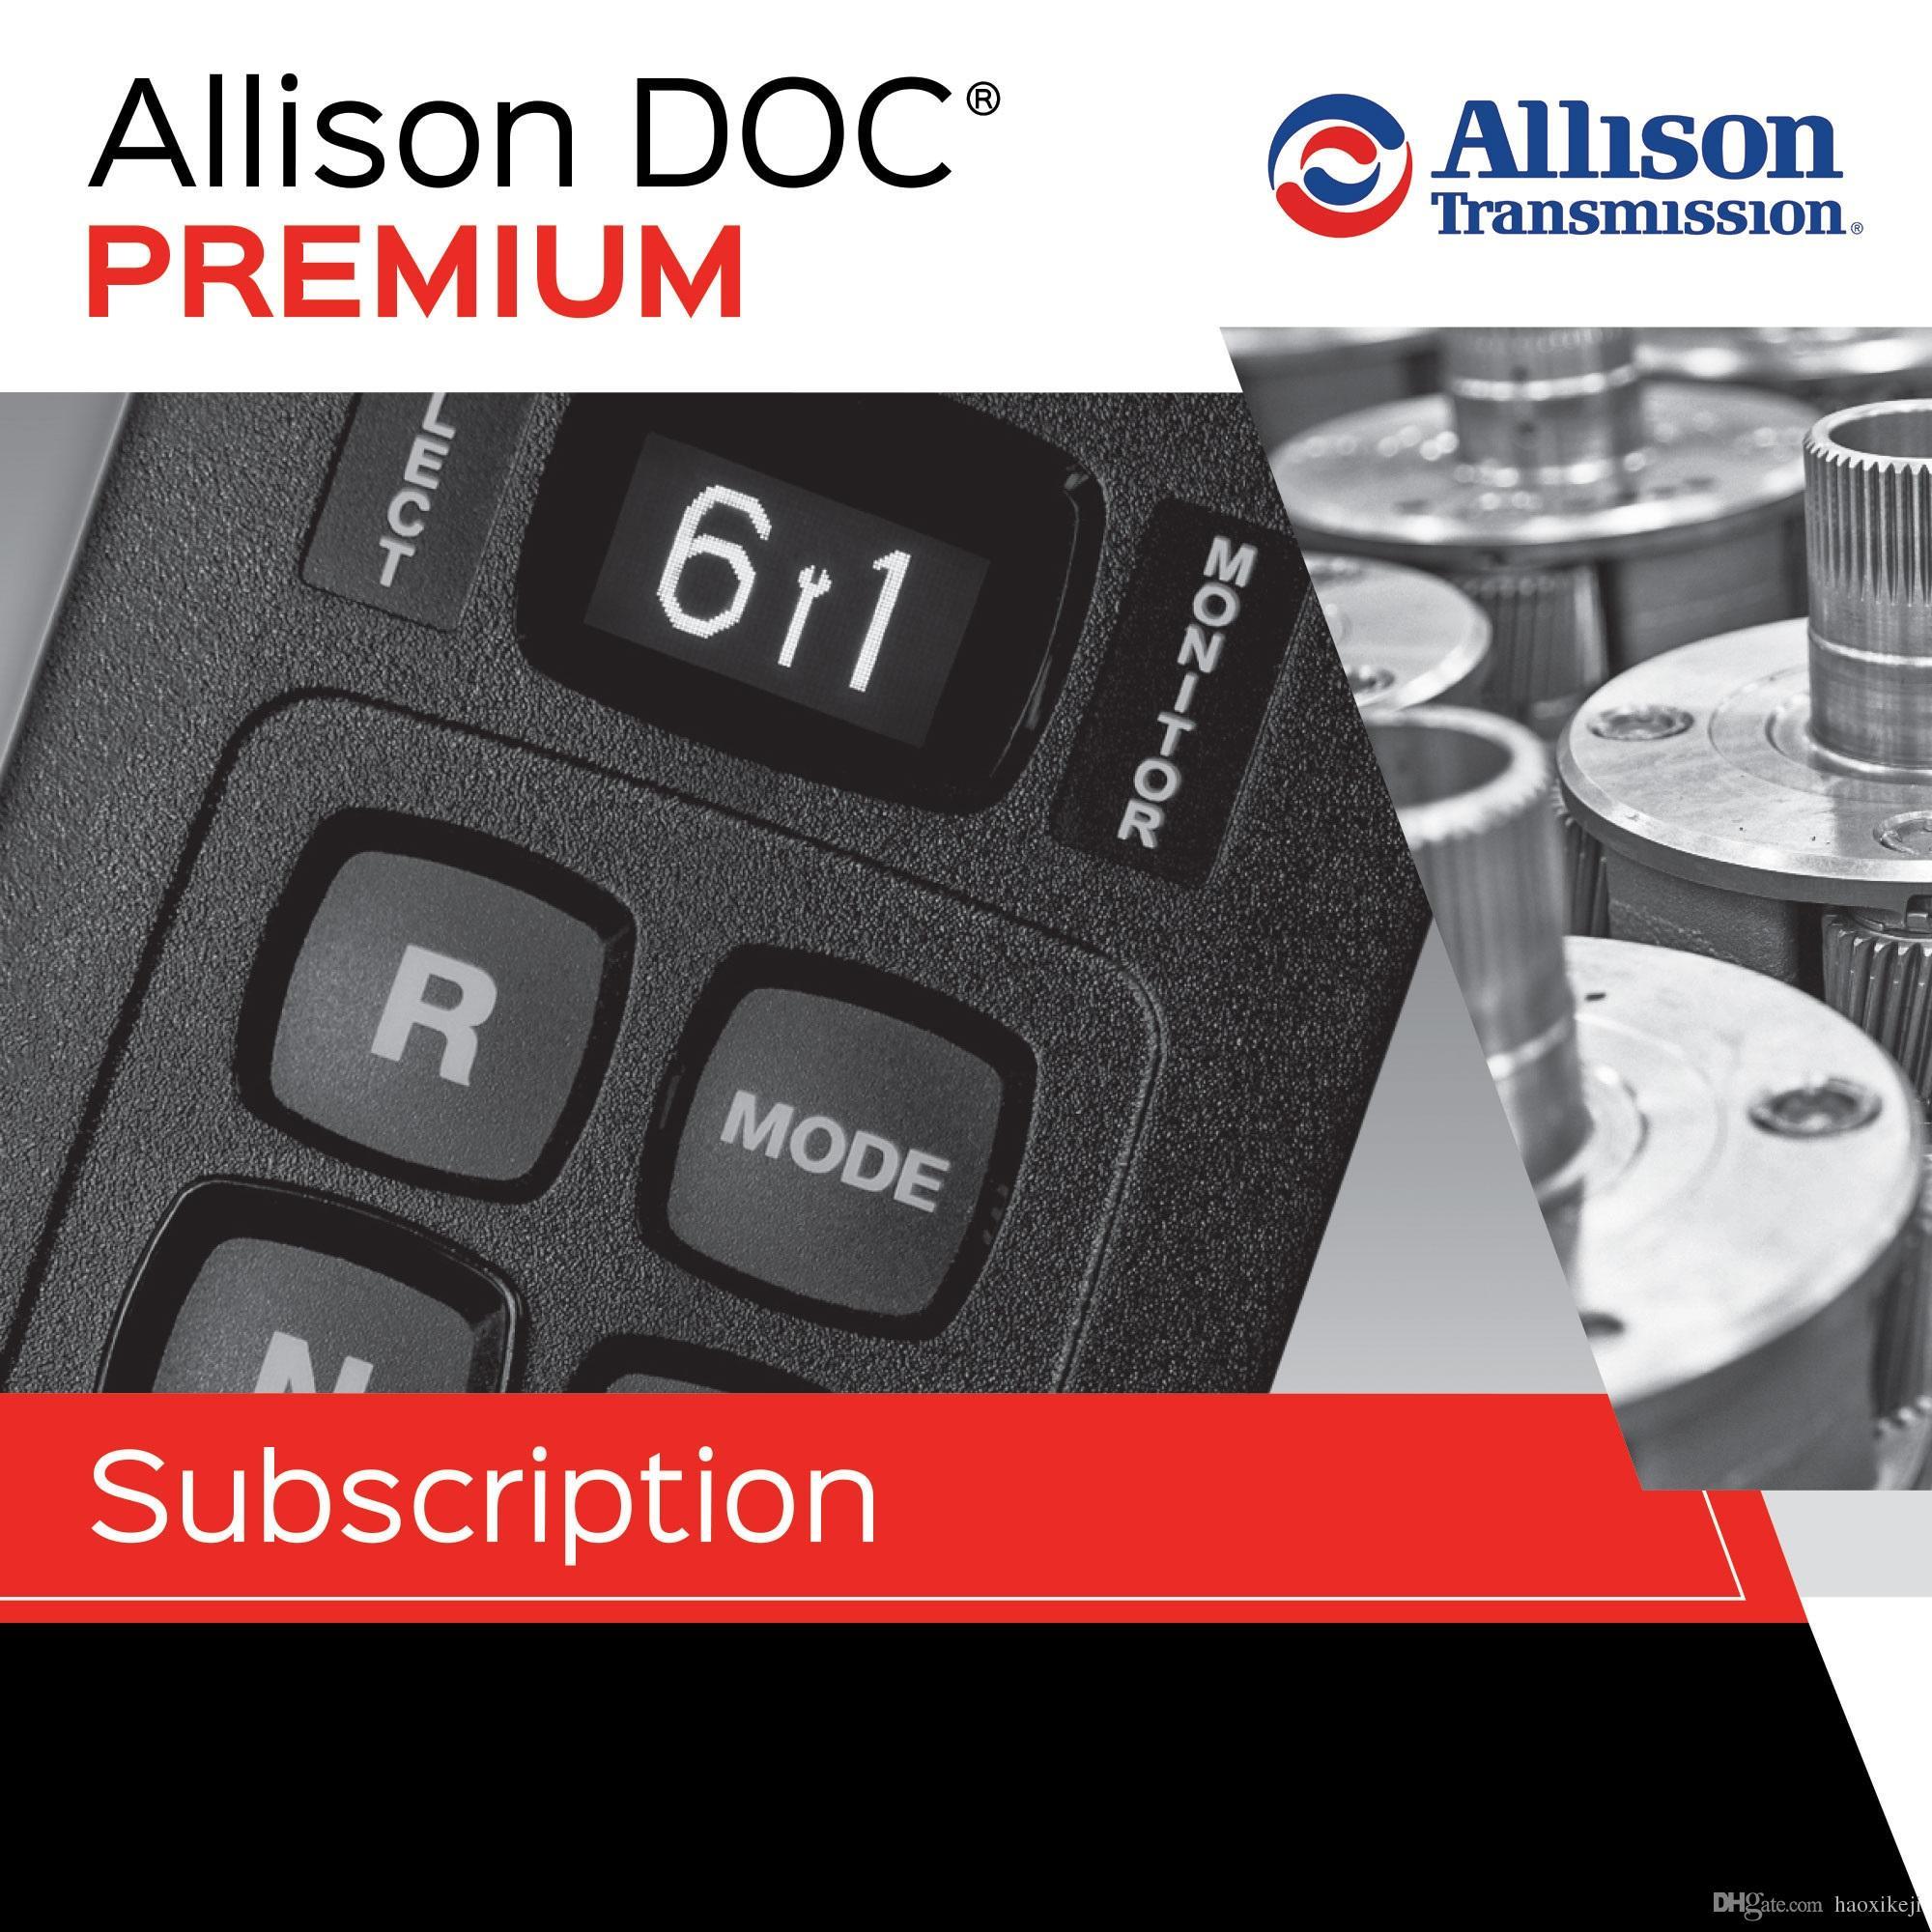 New 100% Universal Allison DOC For PC - Service Tool 2017v2